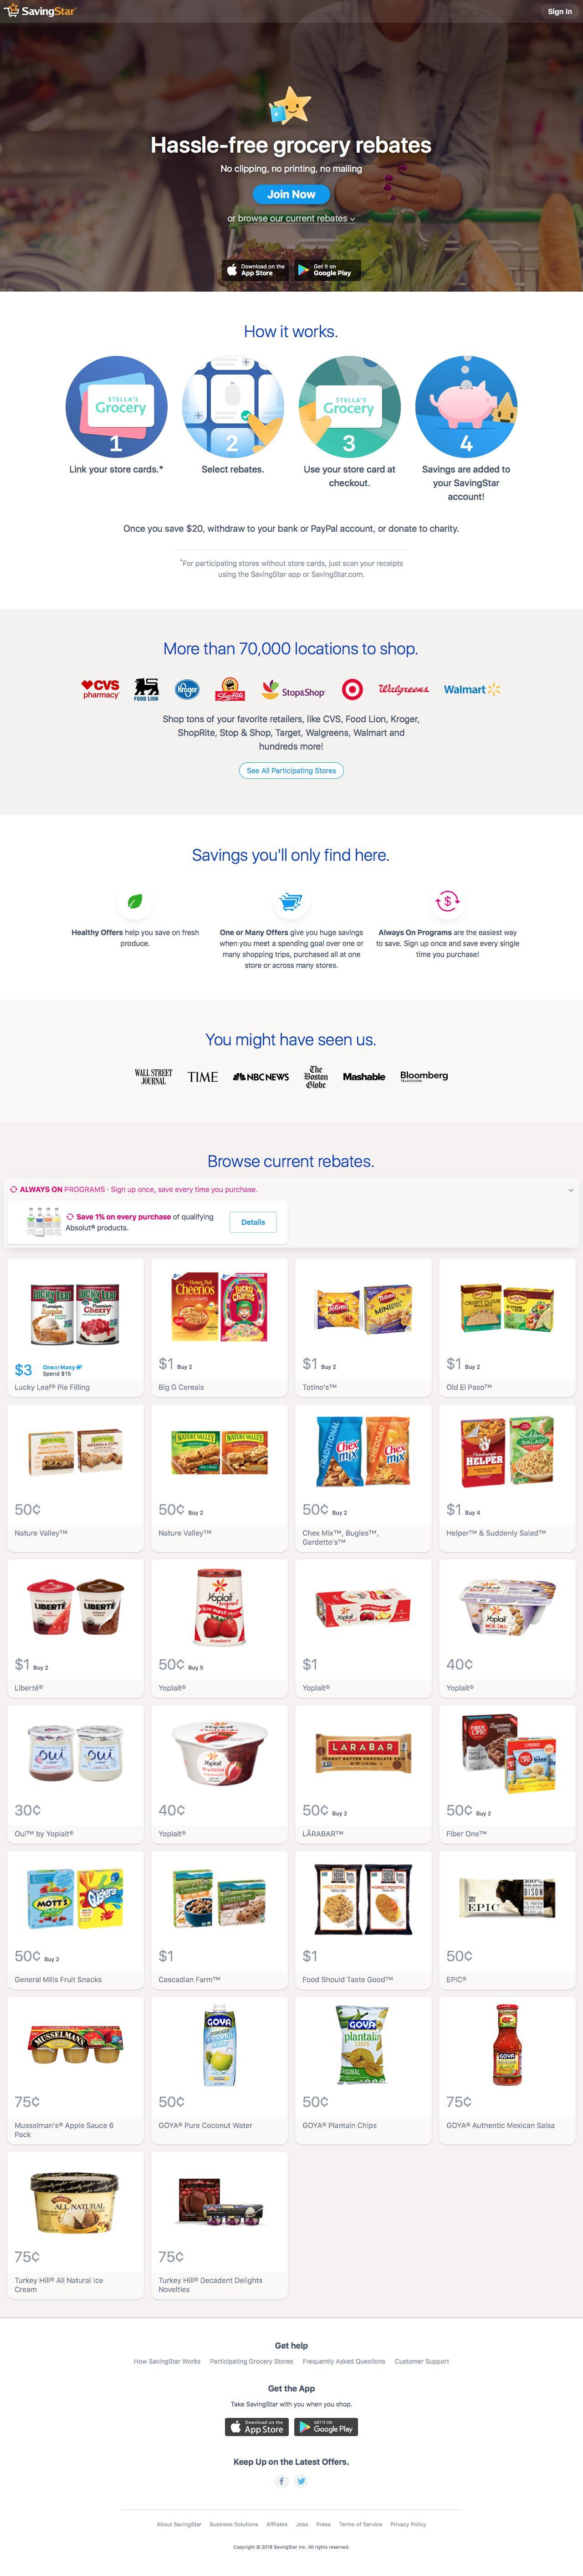 Screenshot of savingstar.com - SavingStar | Cash back on groceries with coupons & deals - captured June 17, 2018